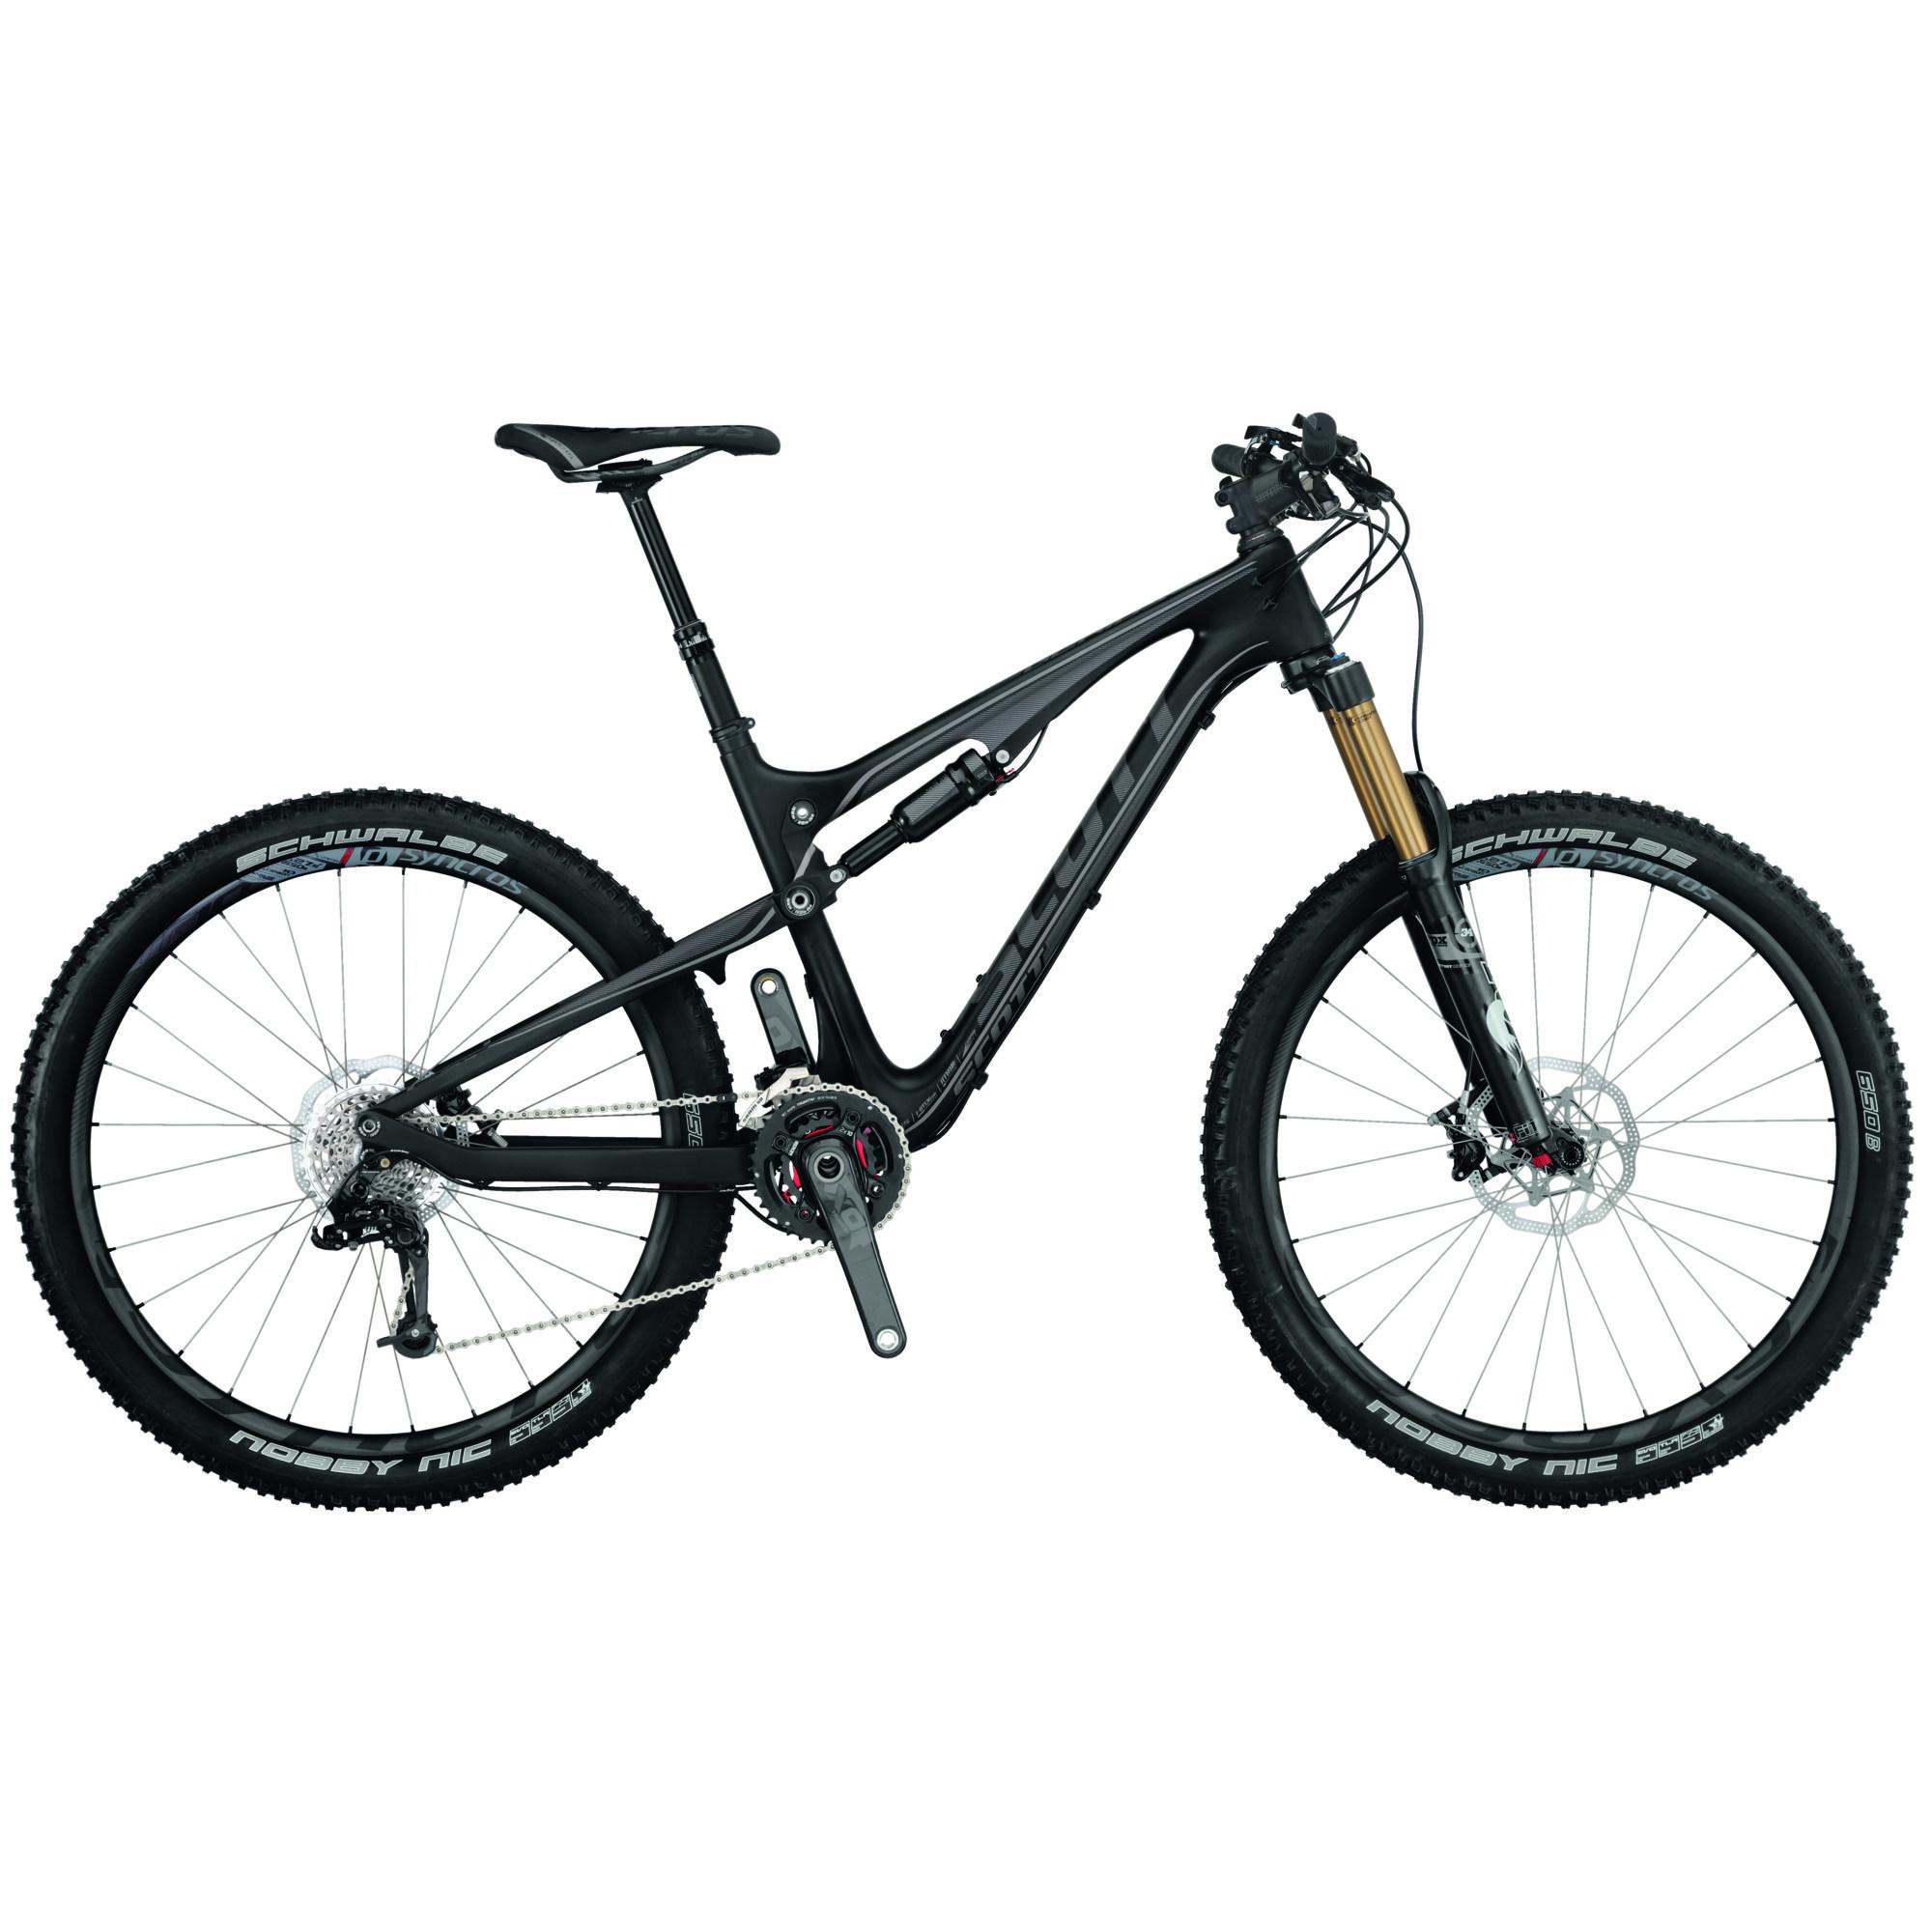 Scott Genius 700 Sl The Ultimate Dream Bike With Images